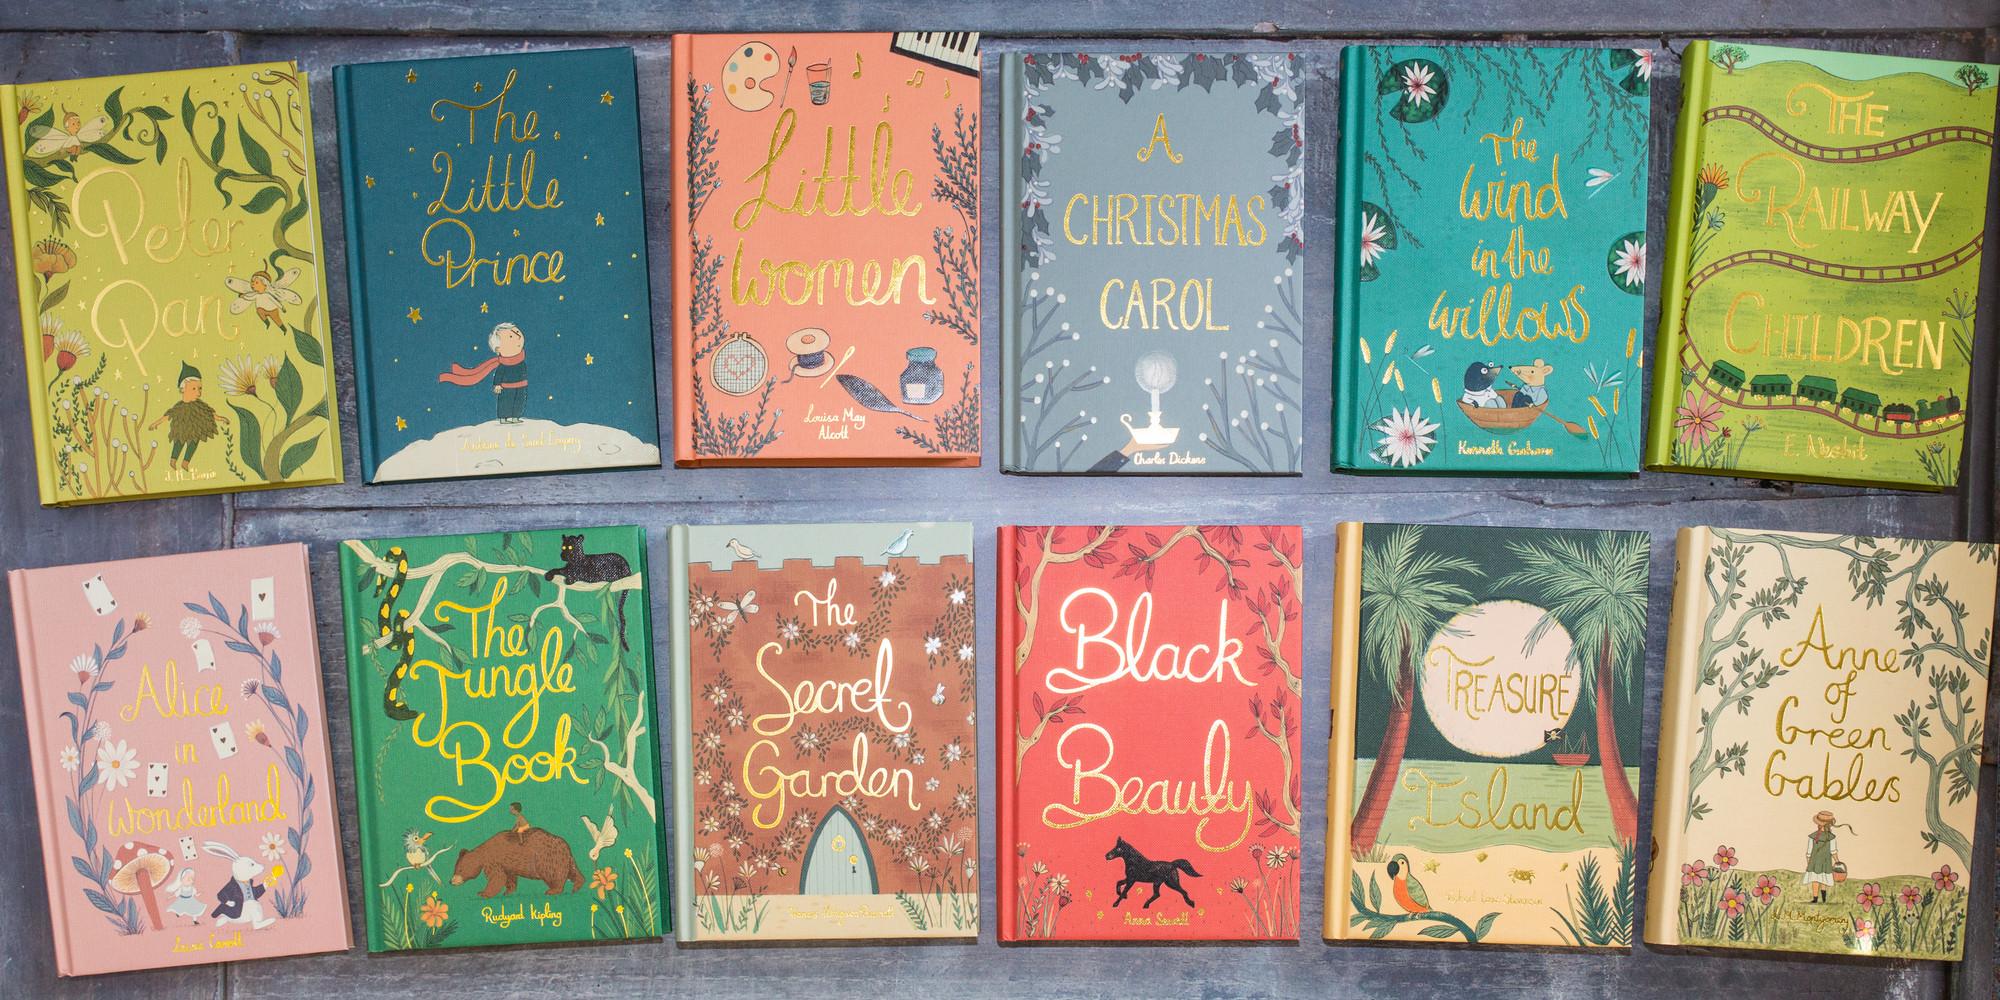 beautifulbooks.info   wordsworth collectors editions full spread